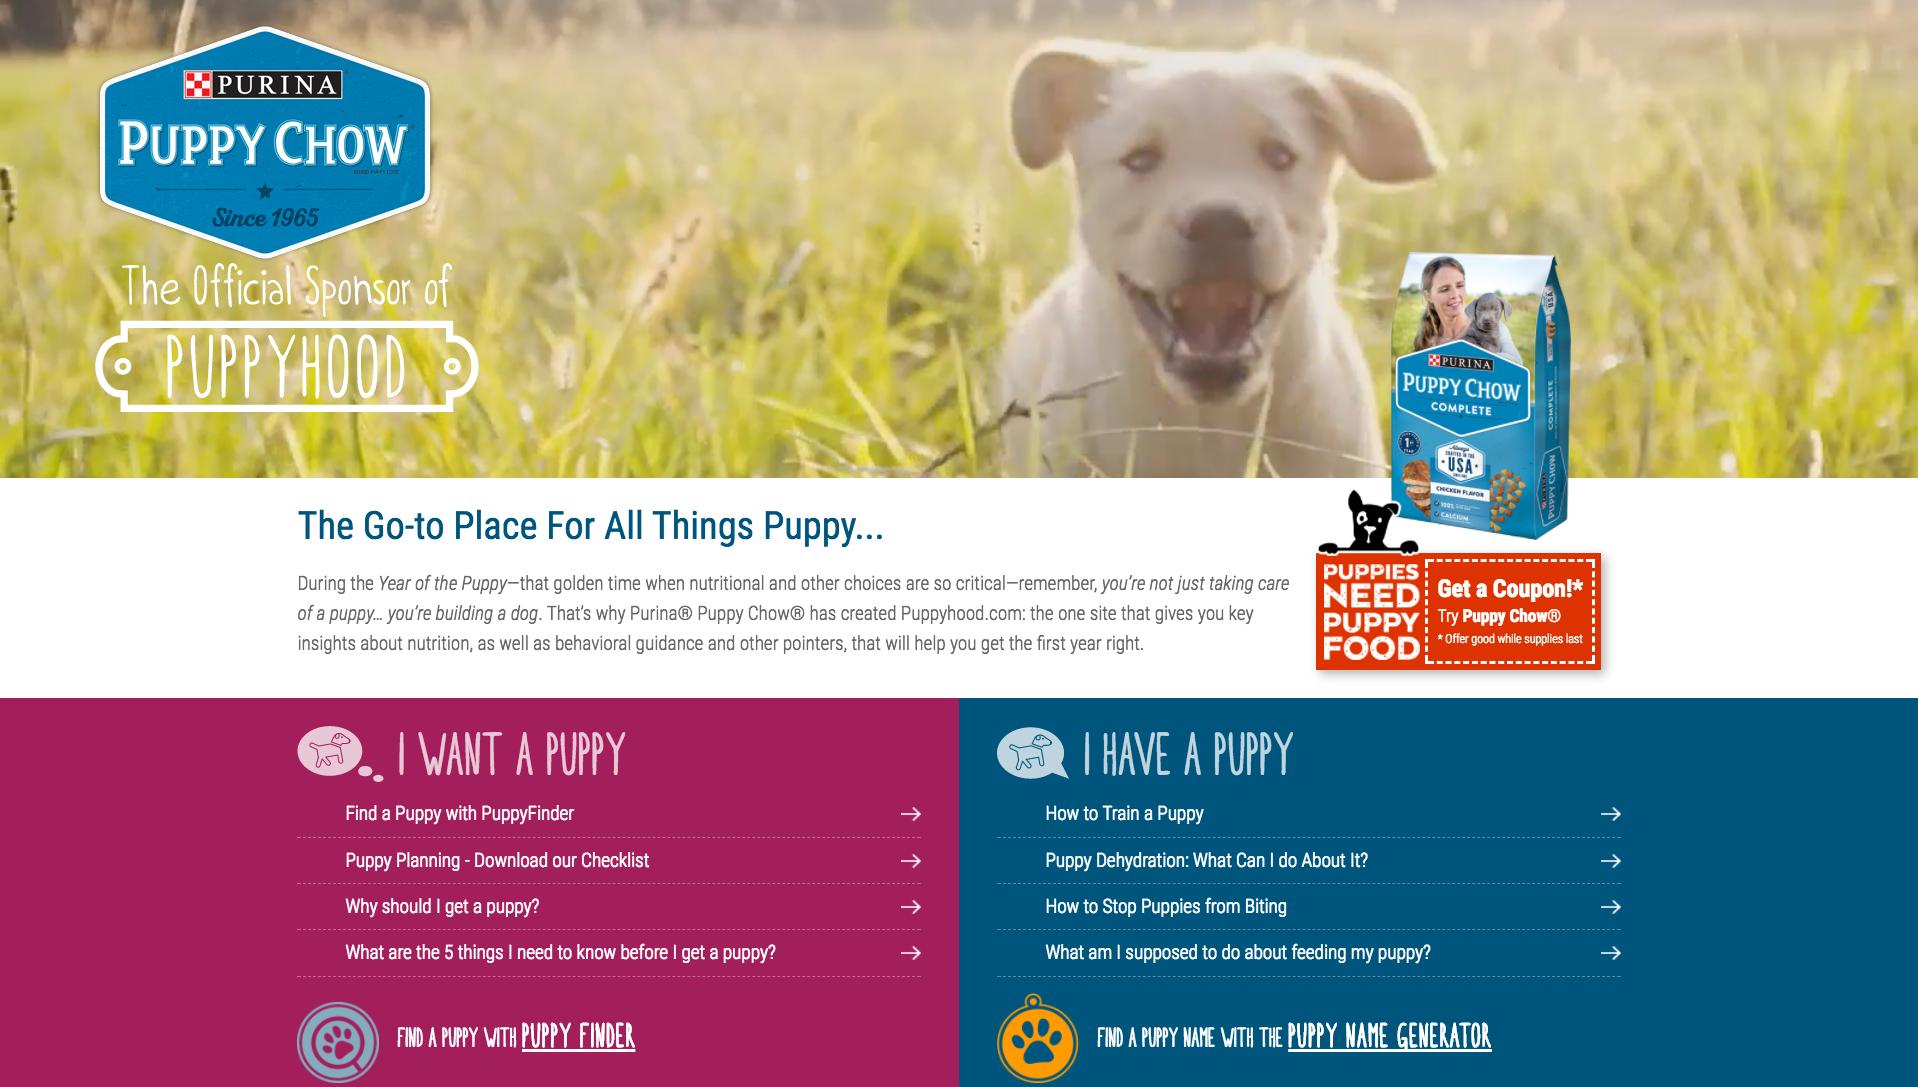 Purina B2C Content Marketing Examples